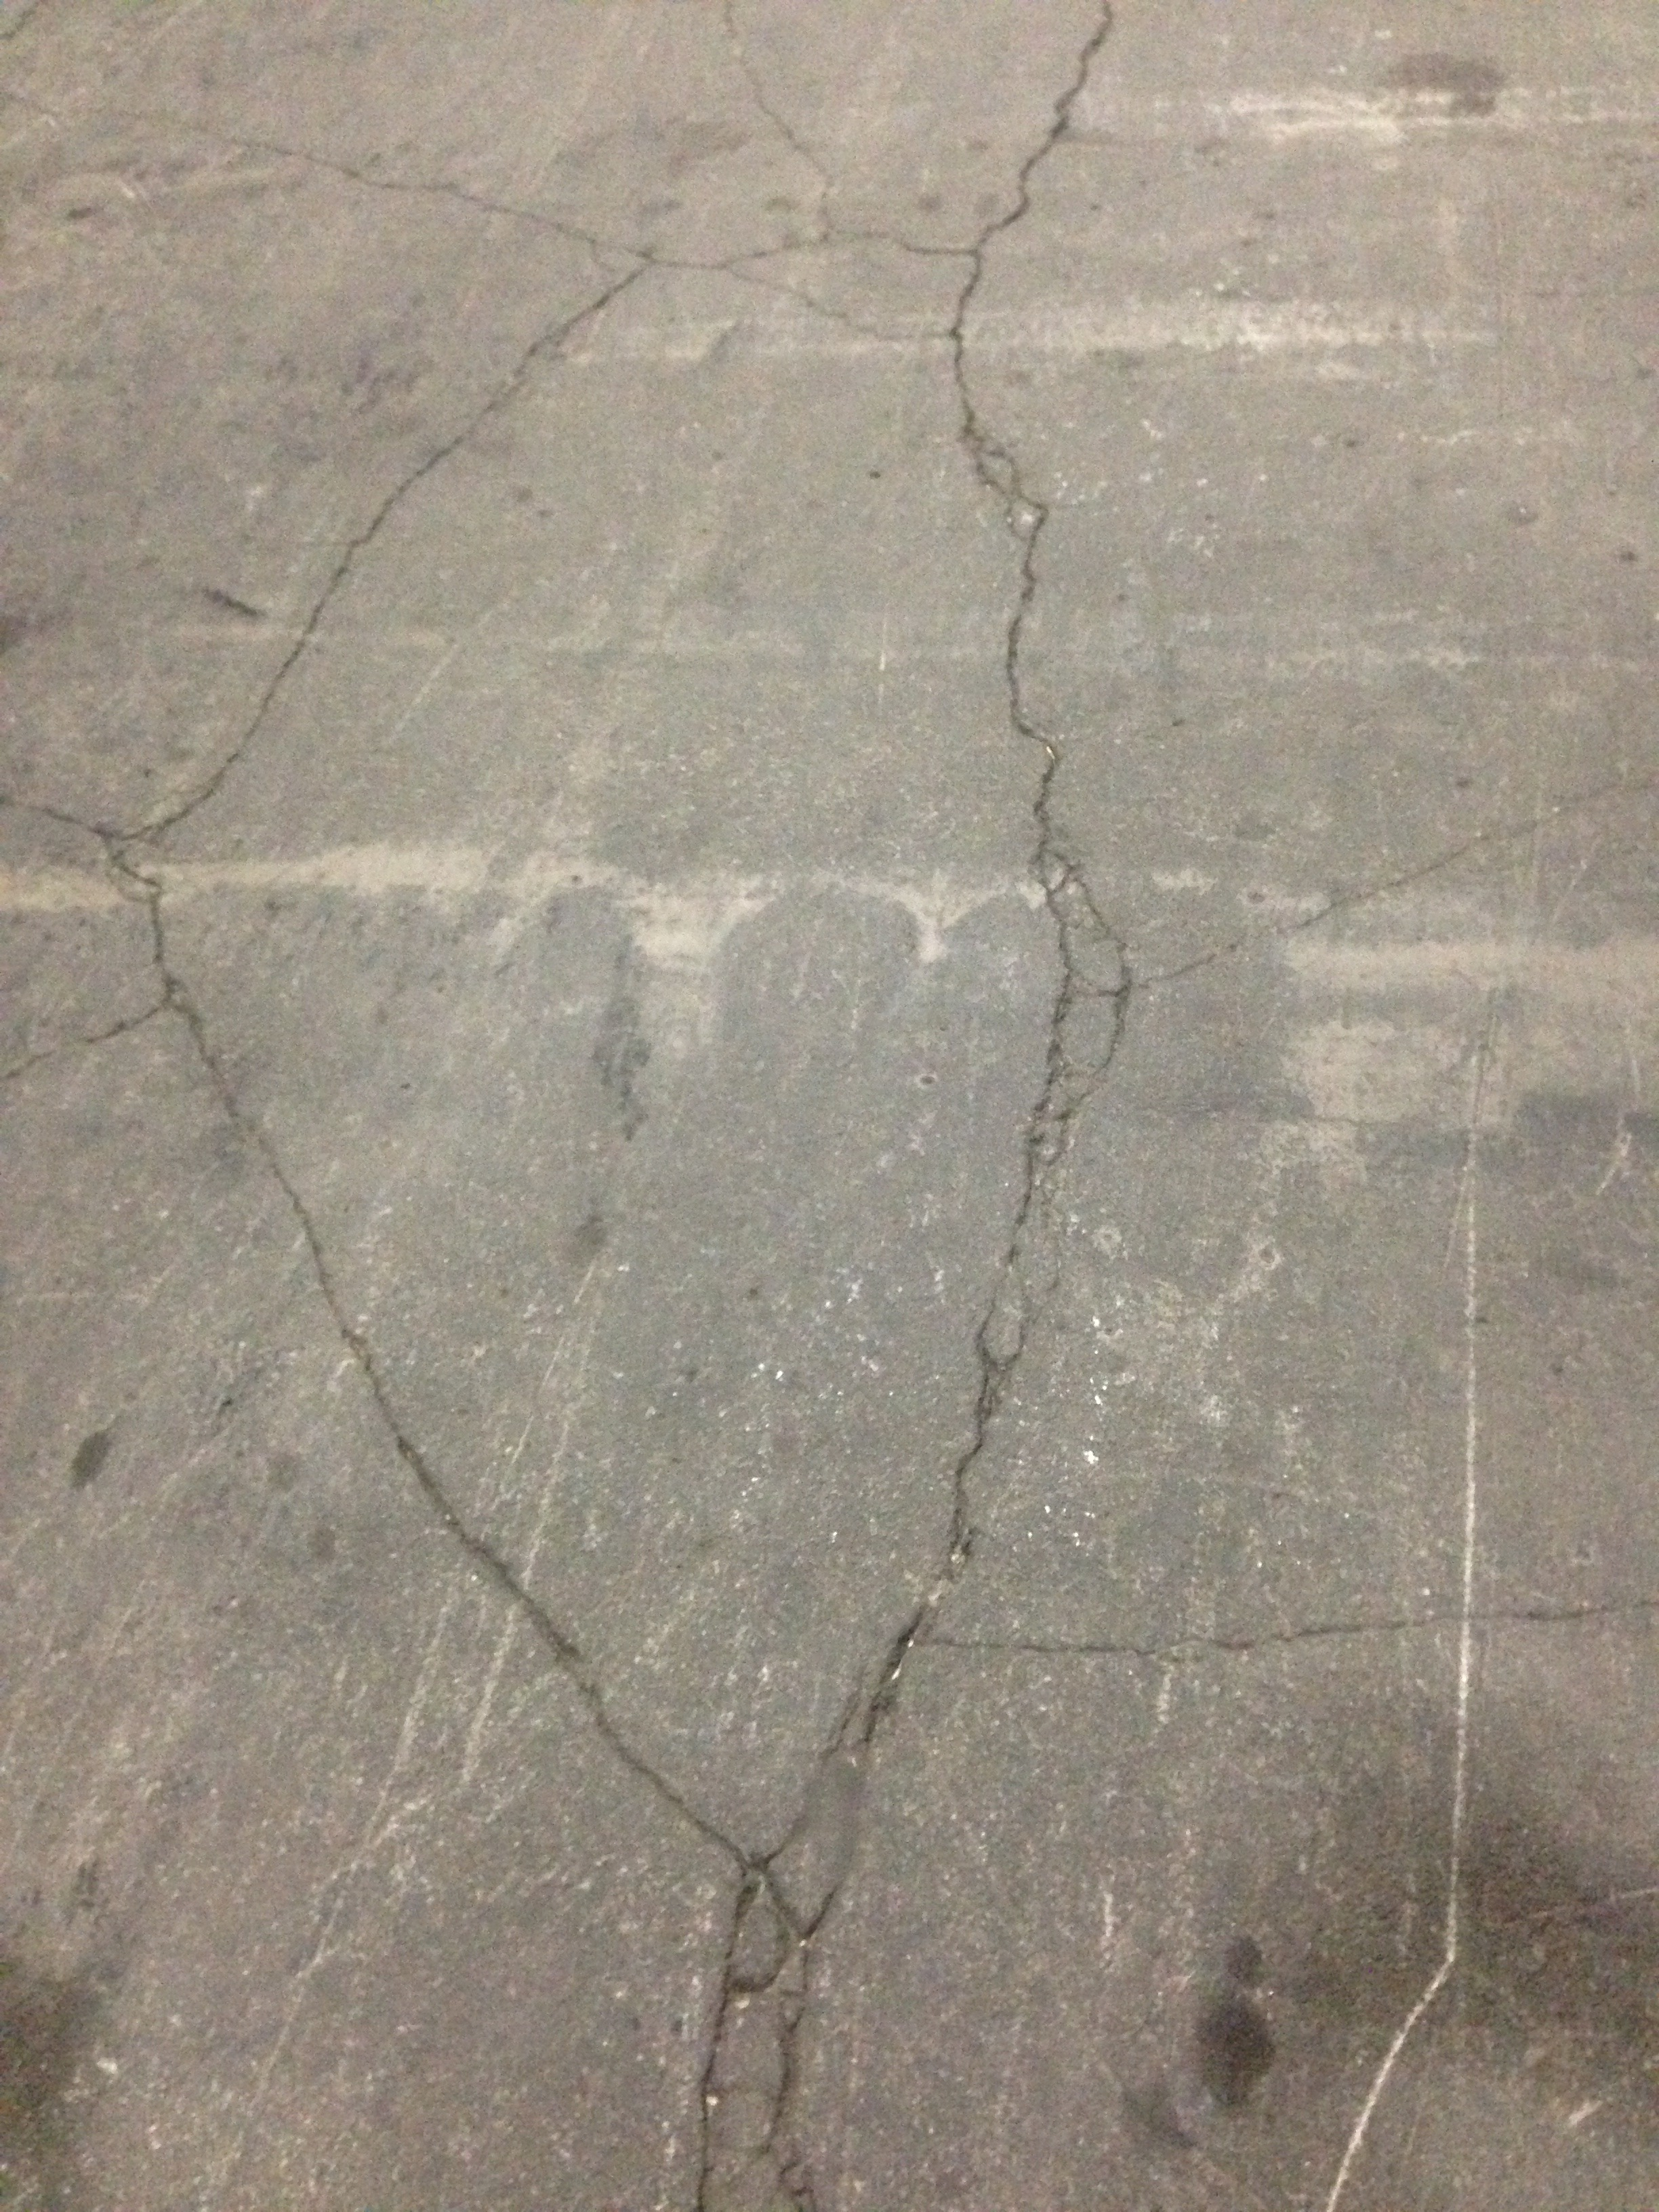 Freezer Cracks